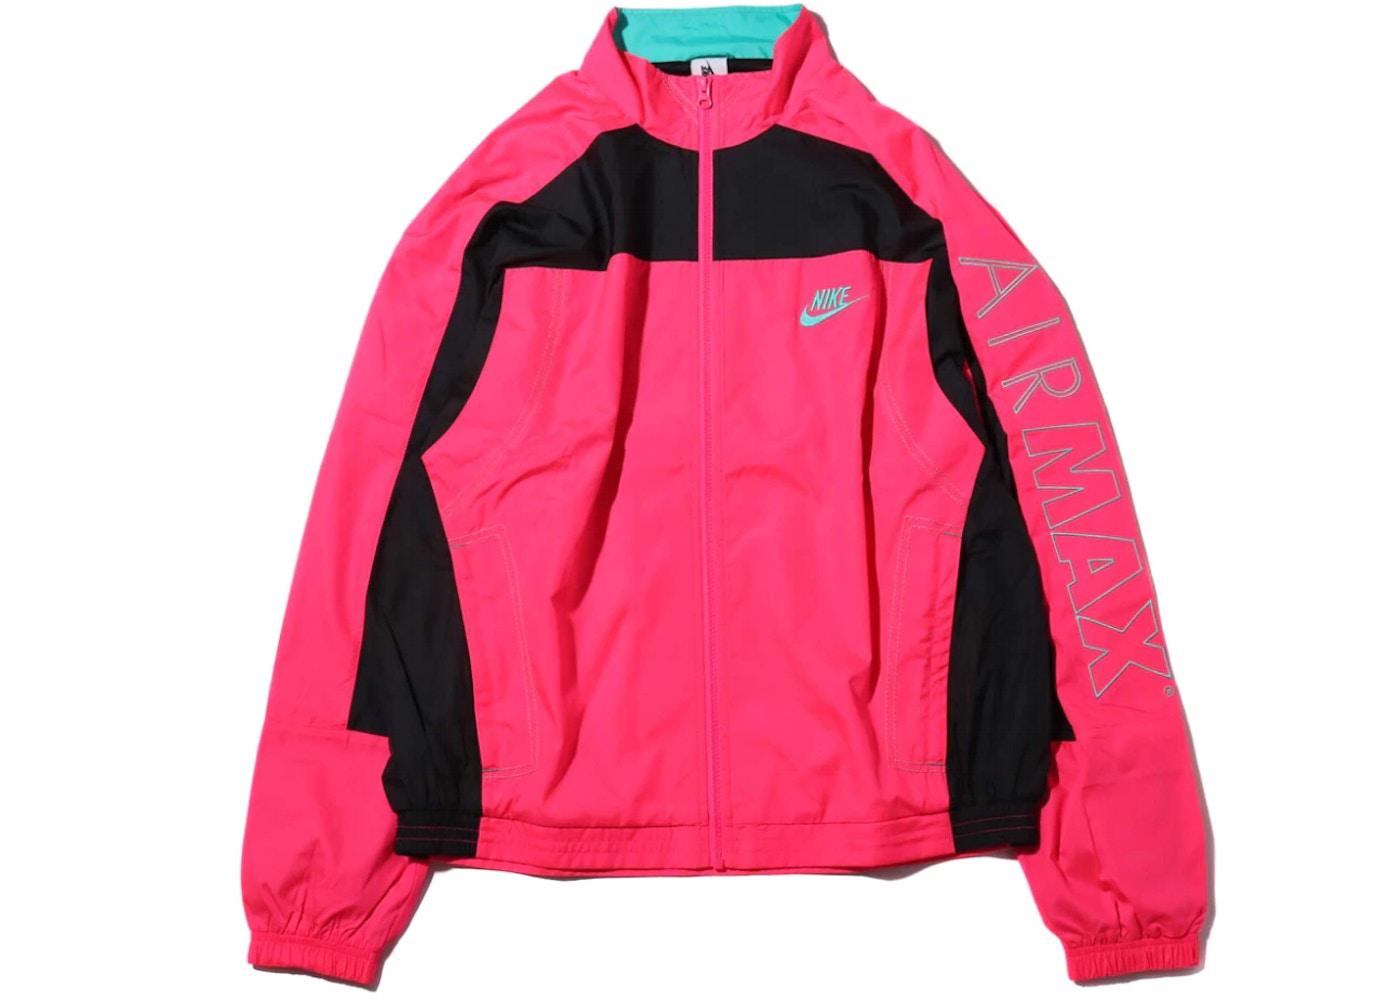 boleto acceso web  Nike x Atmos NRG Vintage Patchwork Track Jacket Pink/Black/Hyper Jade - SS19